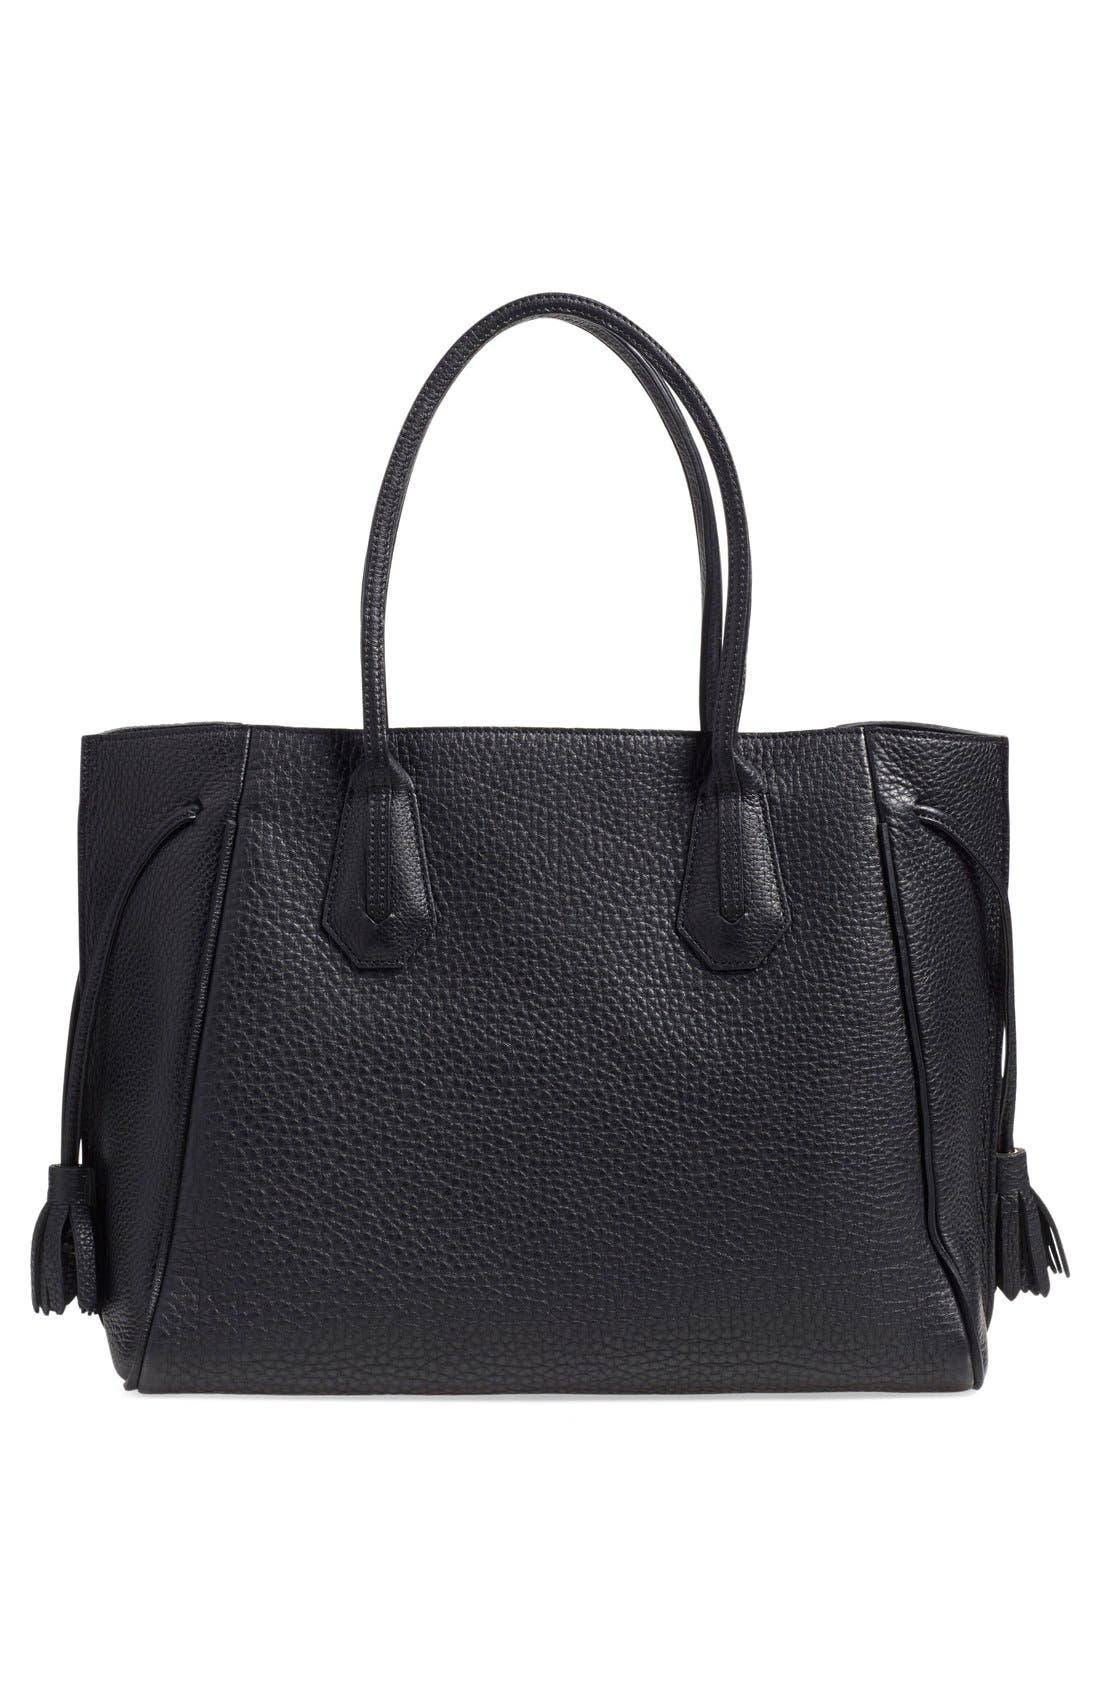 Alternate Image 3  - Longchamp 'Penelope' Tassel Drawstring Leather Tote